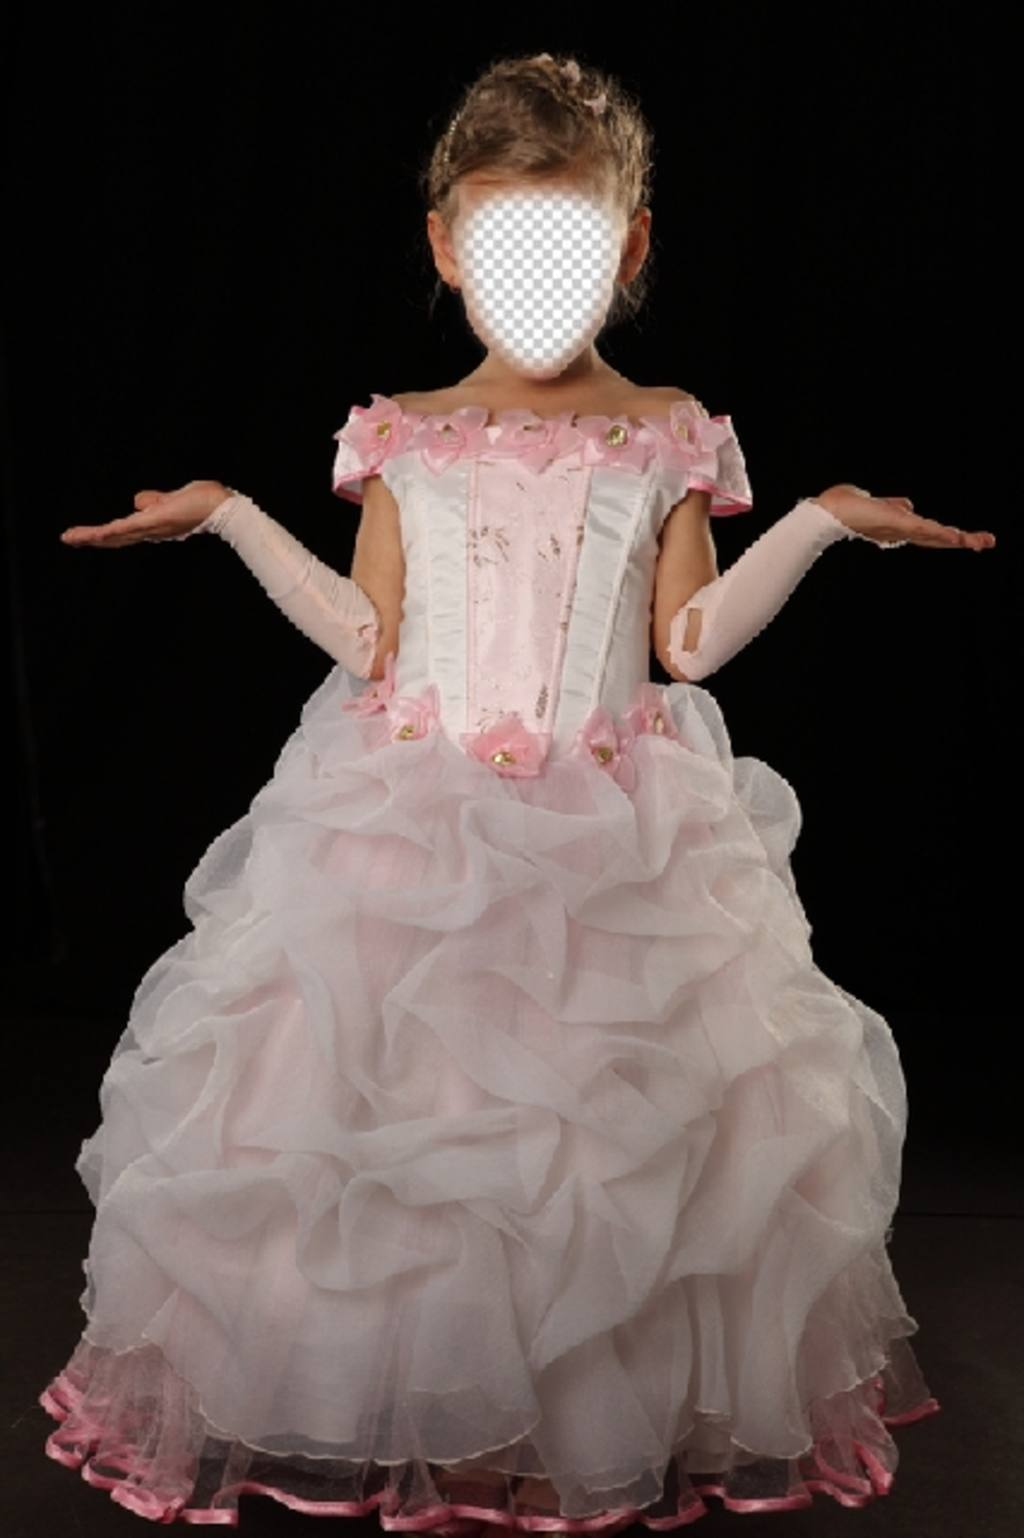 Devenir une petite princesse avec ce photomontage